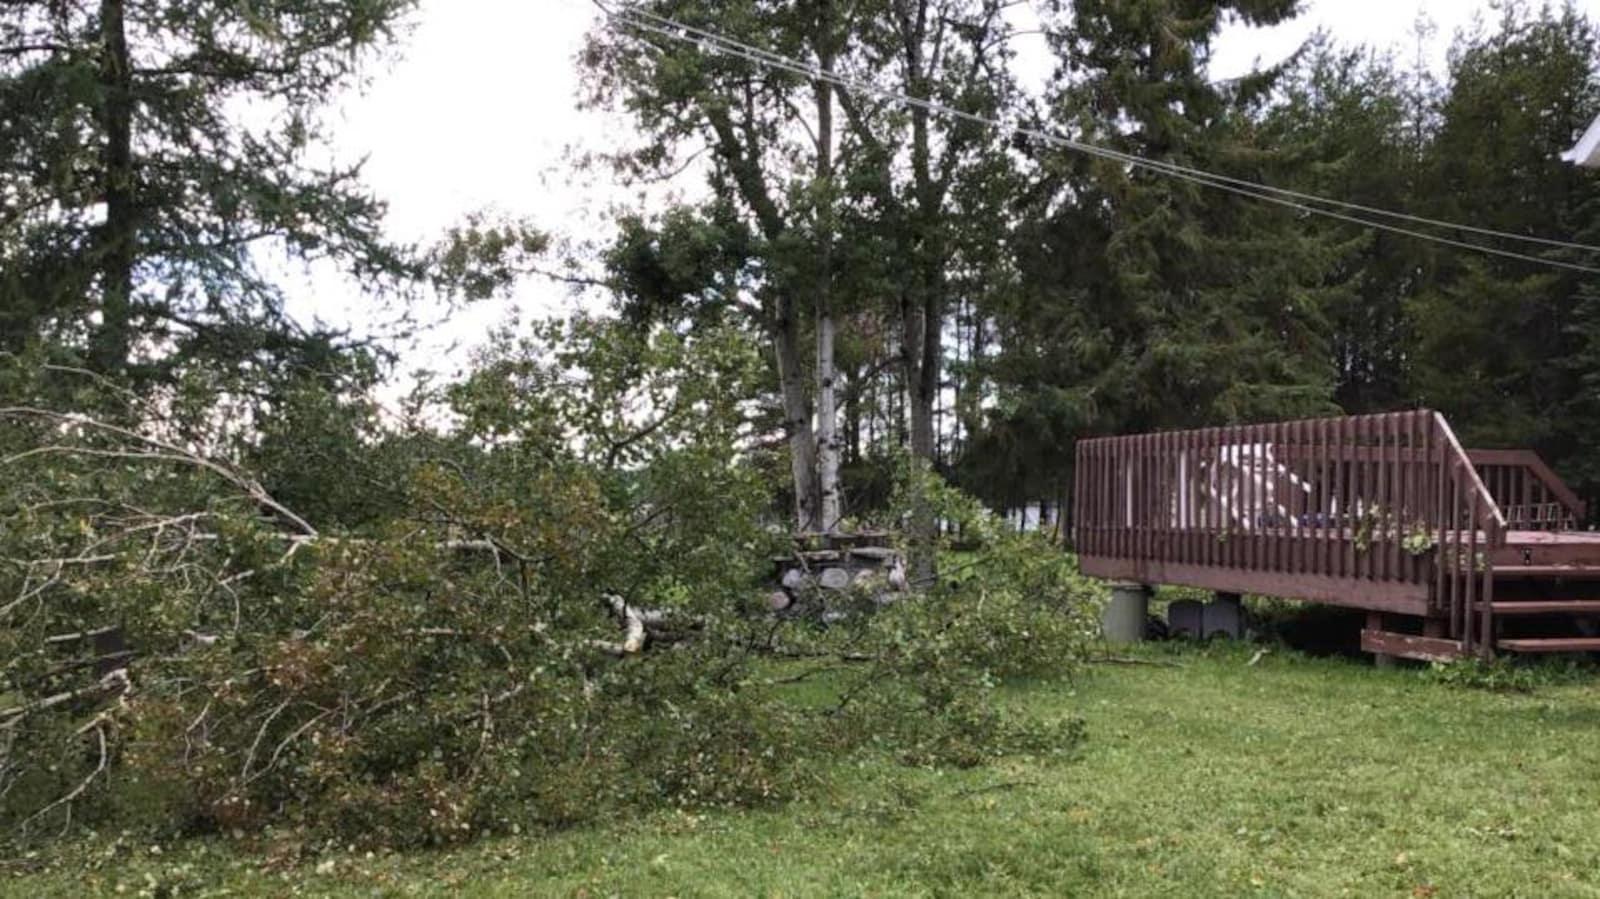 Un arbre est tombé au sol après des vents violents.